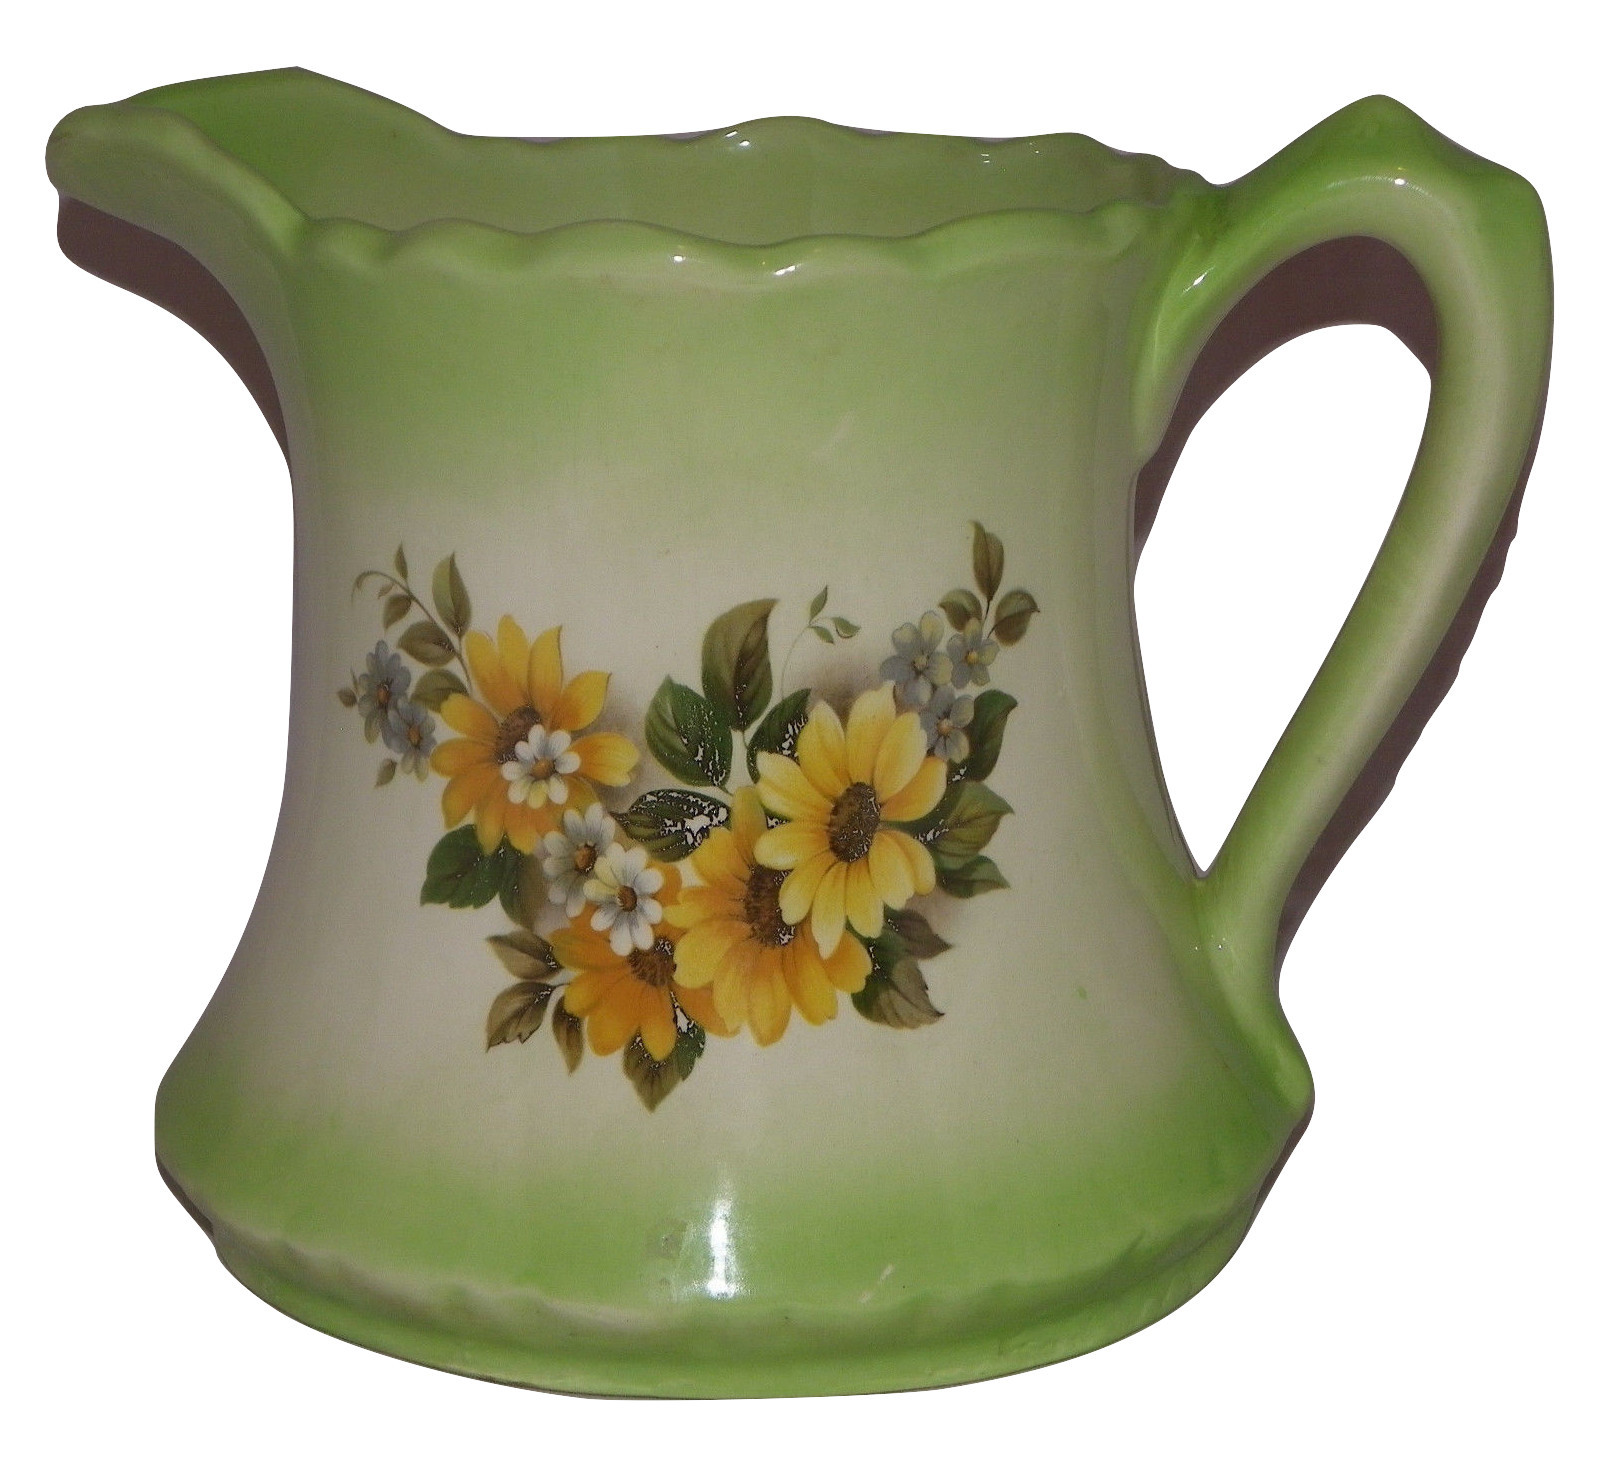 "Sunflower Water Pitcher Green & White Pitcher Scalloped Edge Water Jug 7"" - $34.99"